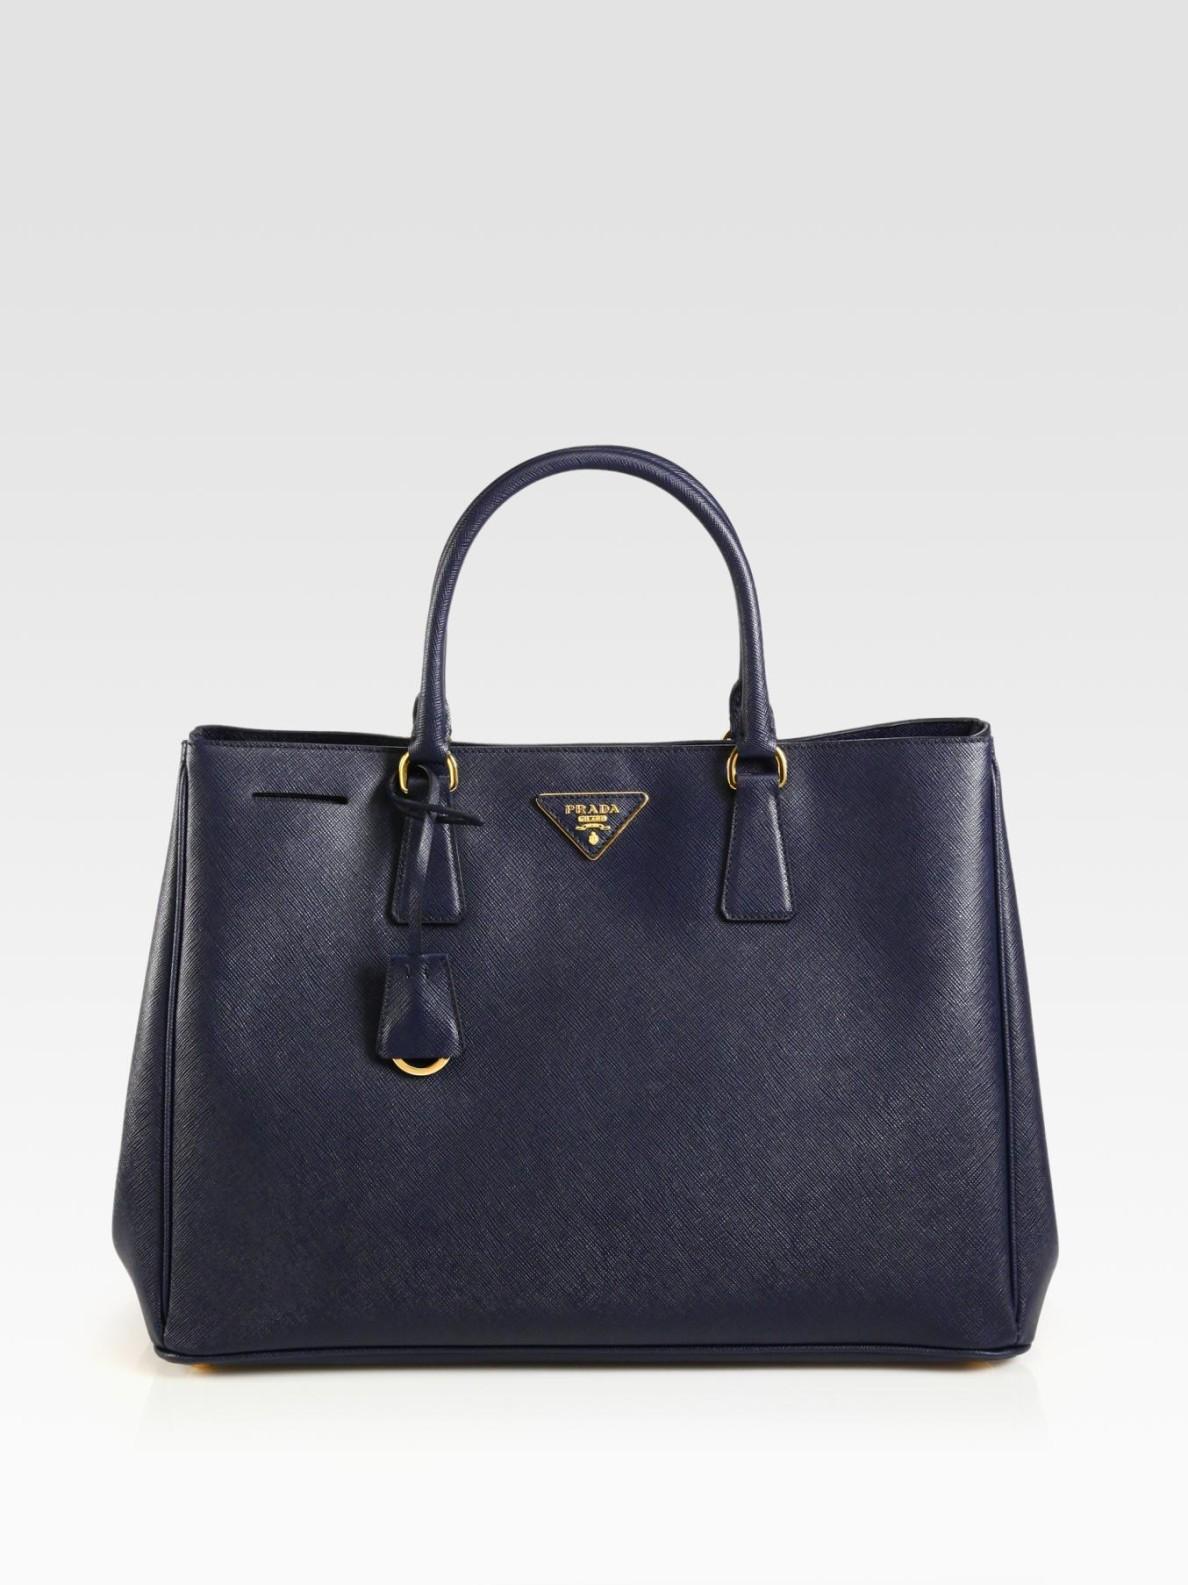 prada fringe handbag - prada-navy-saffiano-lux-tote-bag-product-1-3845370-517398891.jpeg